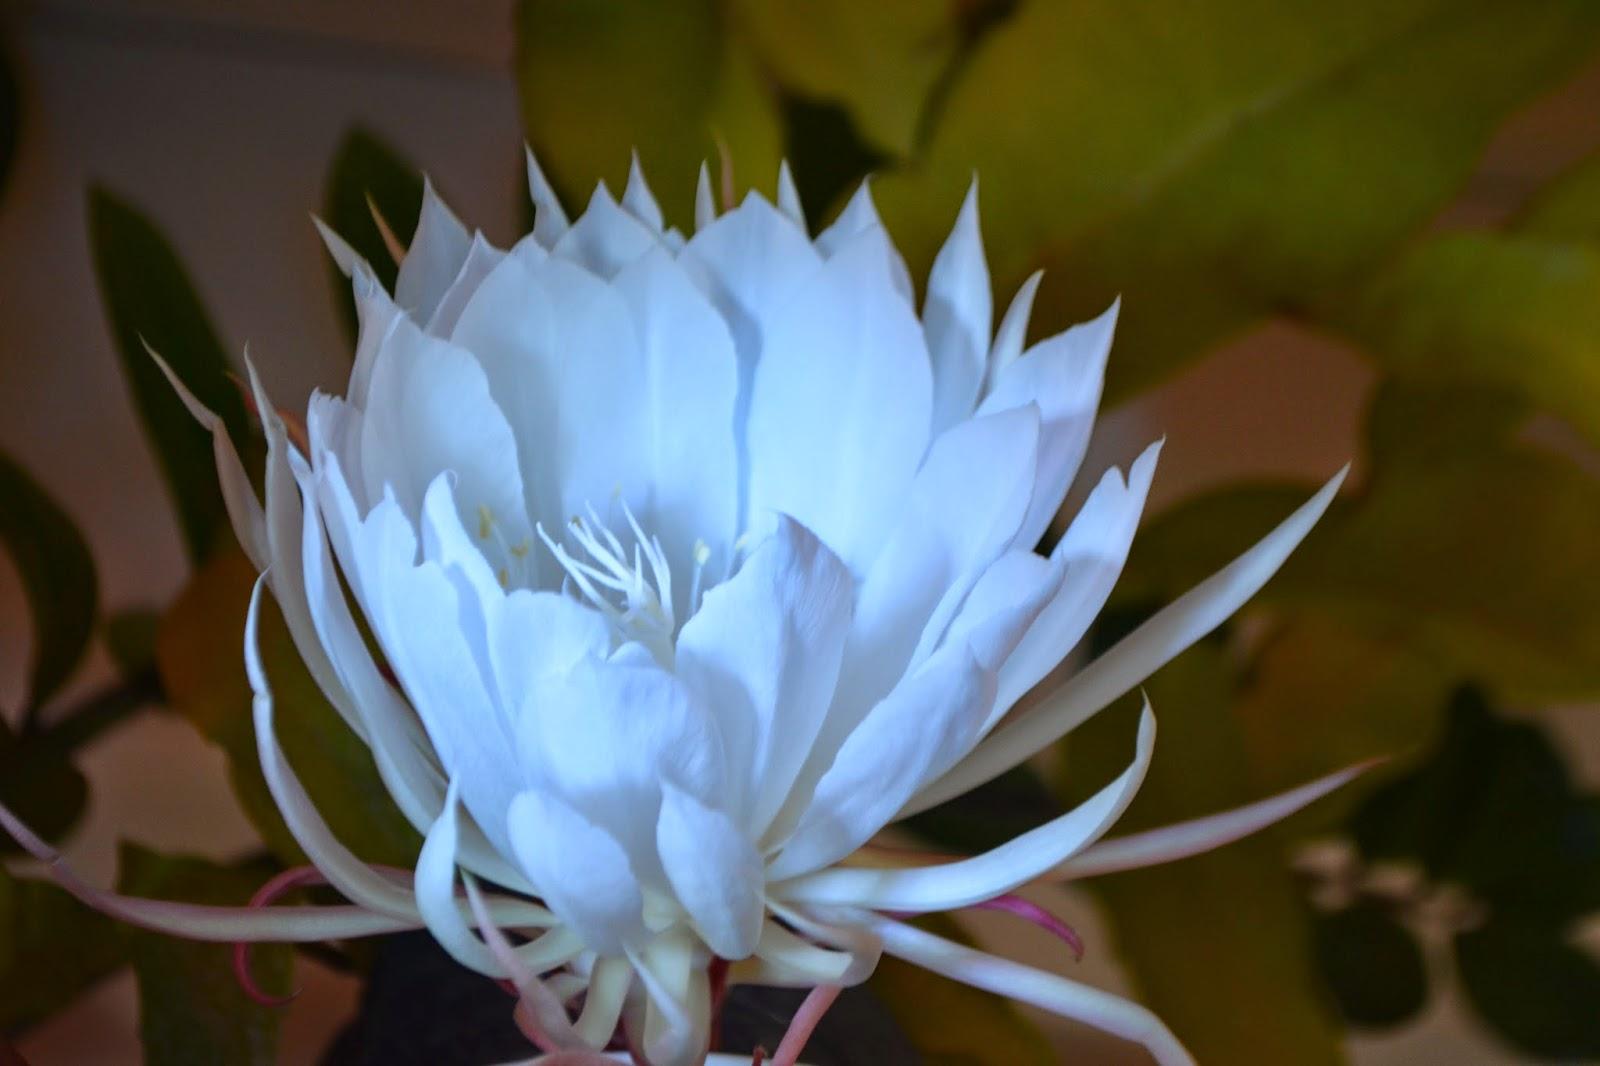 Epiphyllum oxypetalum. Flor de una noche, compleja y perfumada. Epífita o e. Dama de noche. Reina de la noche.